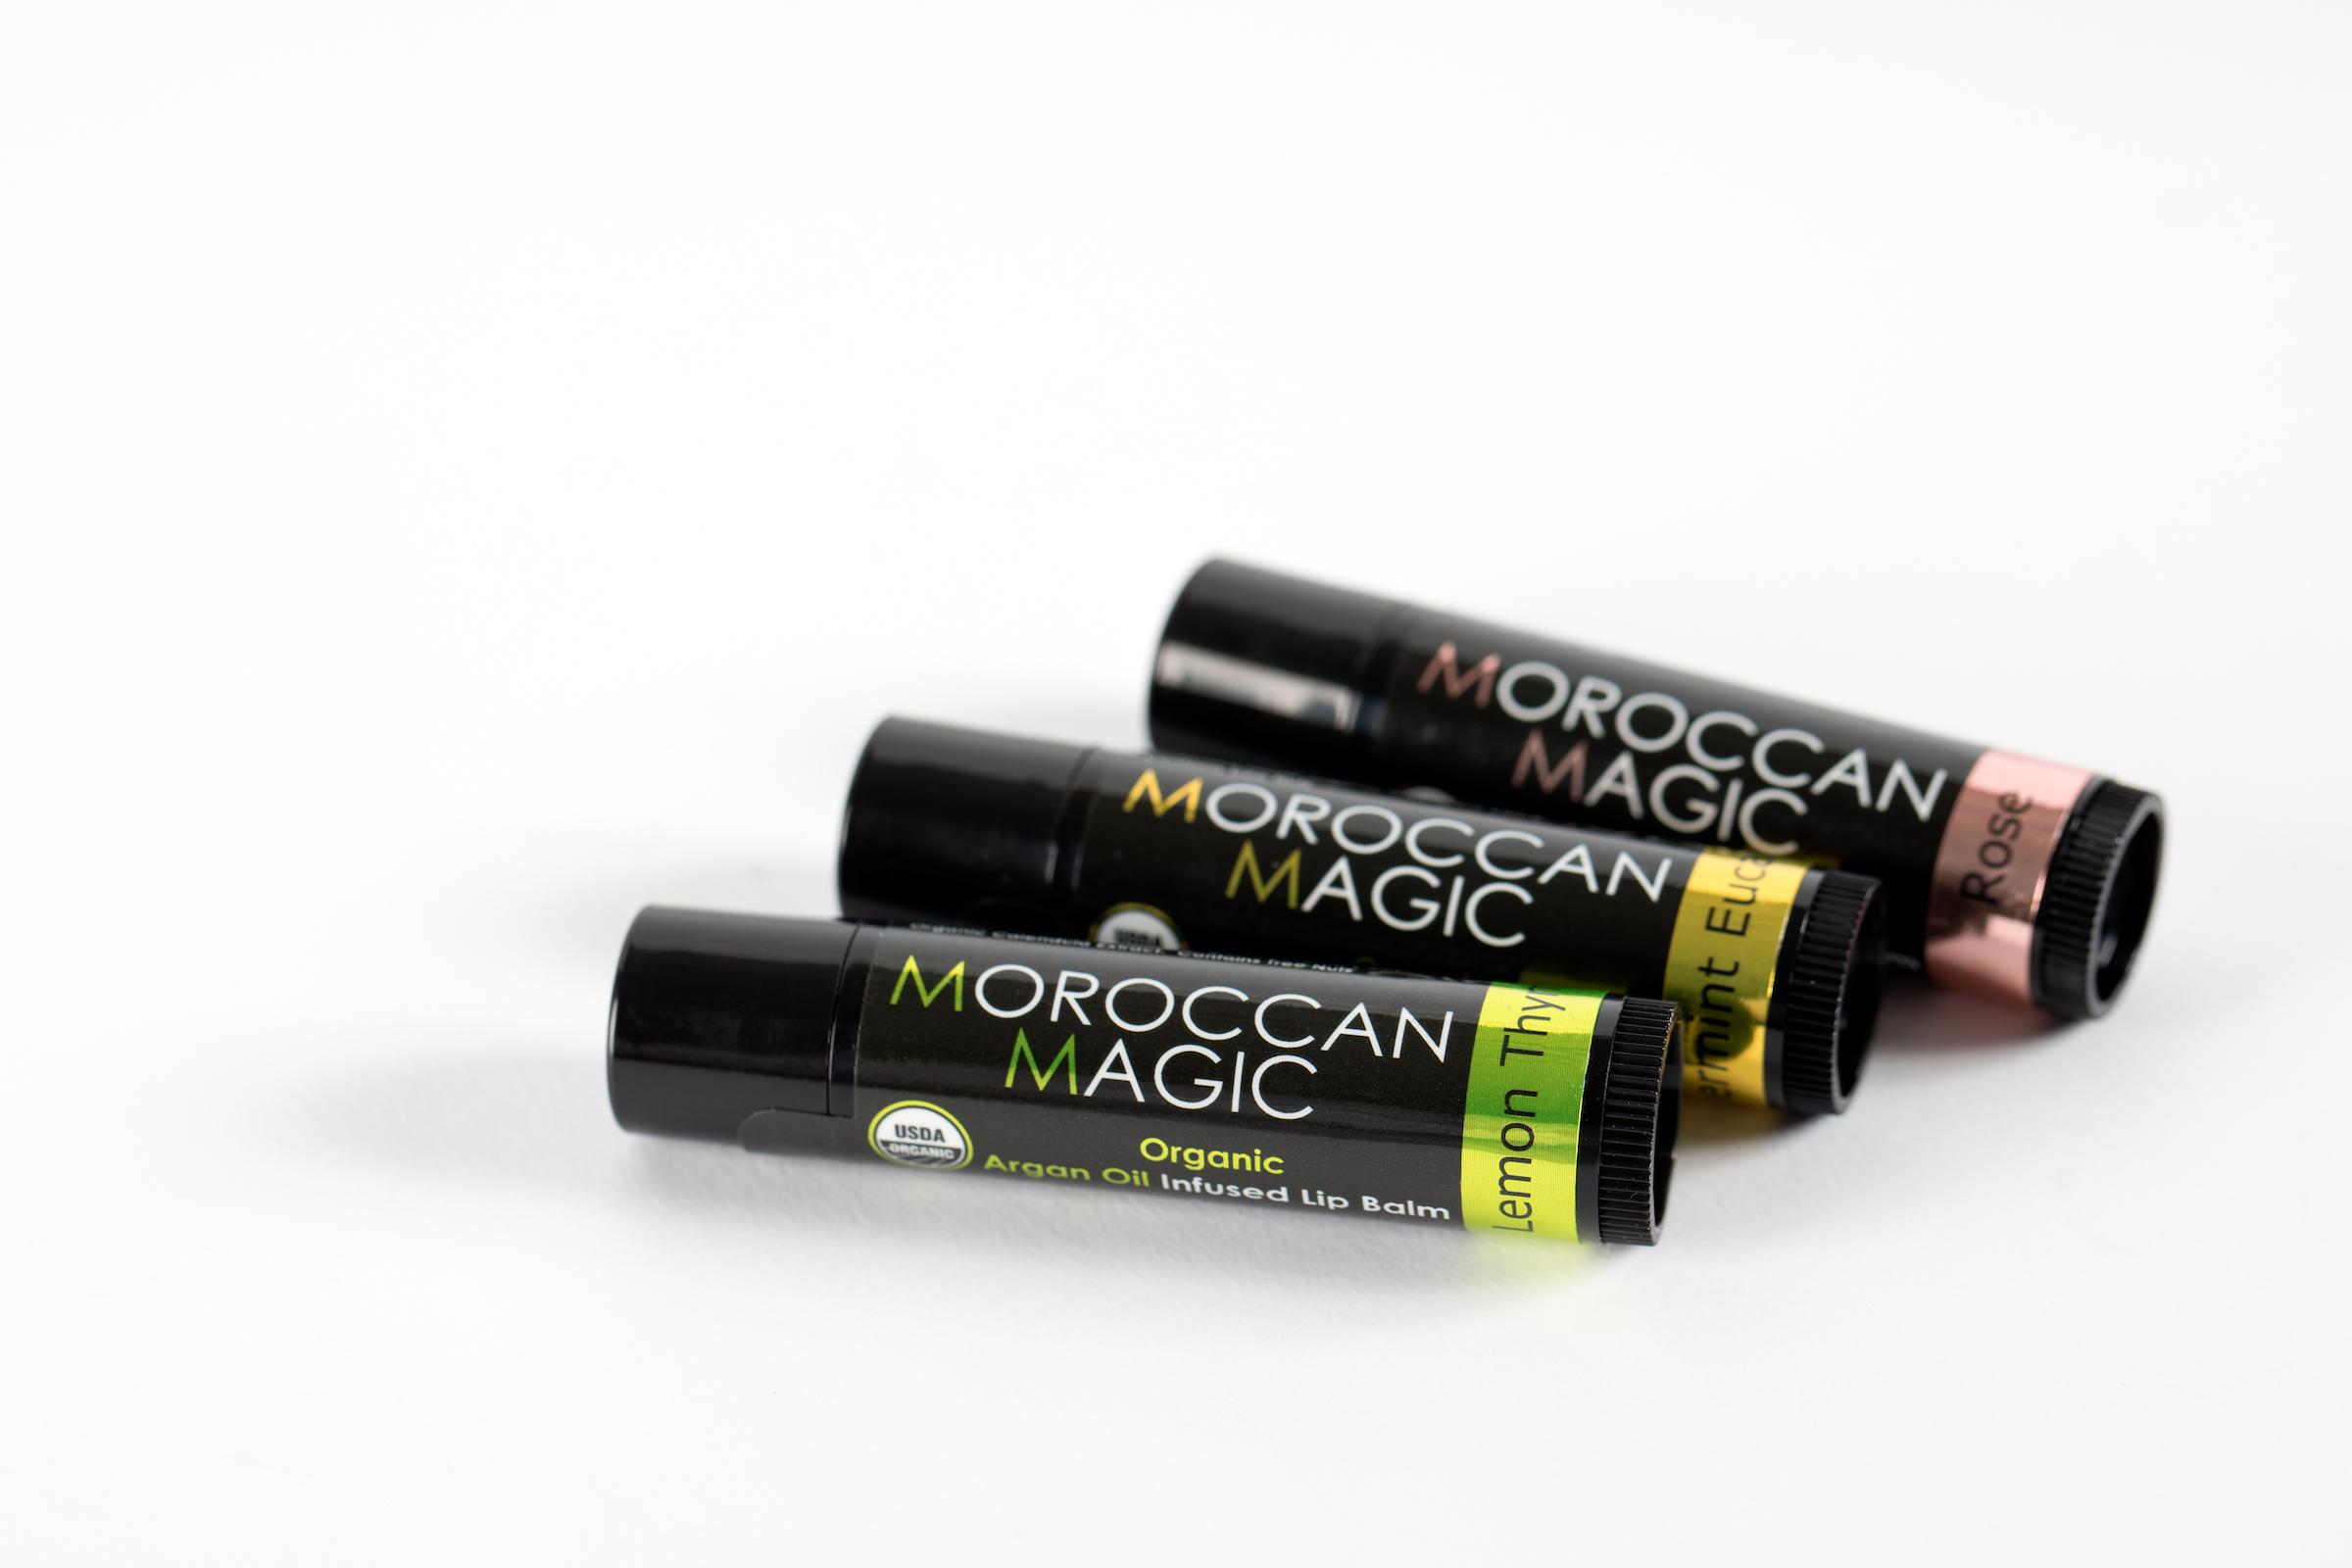 Moroccan Magic Organic Argan Lip Balm for All Seasons